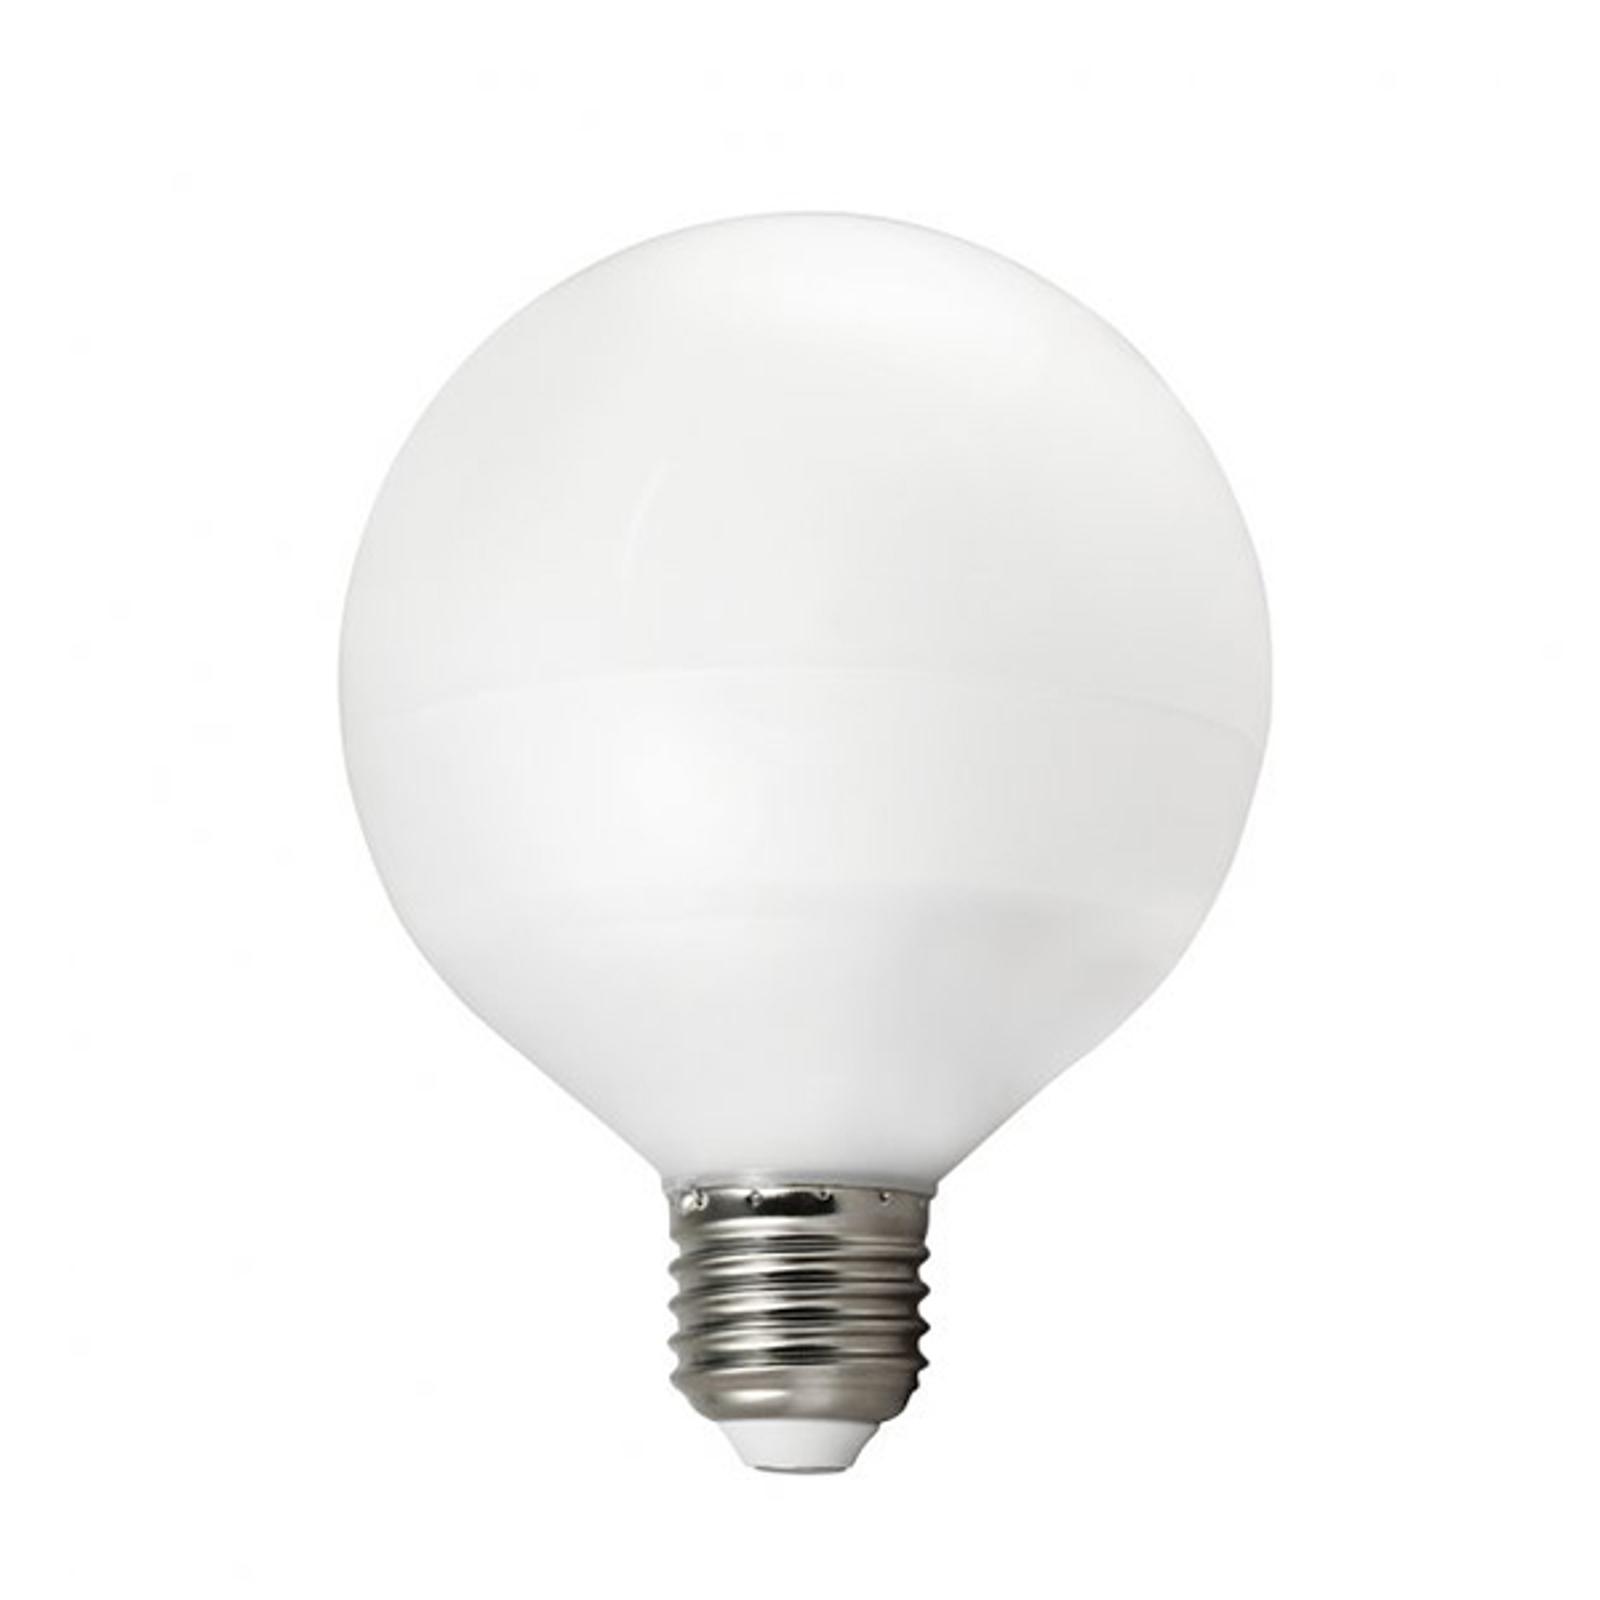 Bomb. t. globo LED E27 13W 827 G95, blanco cálido